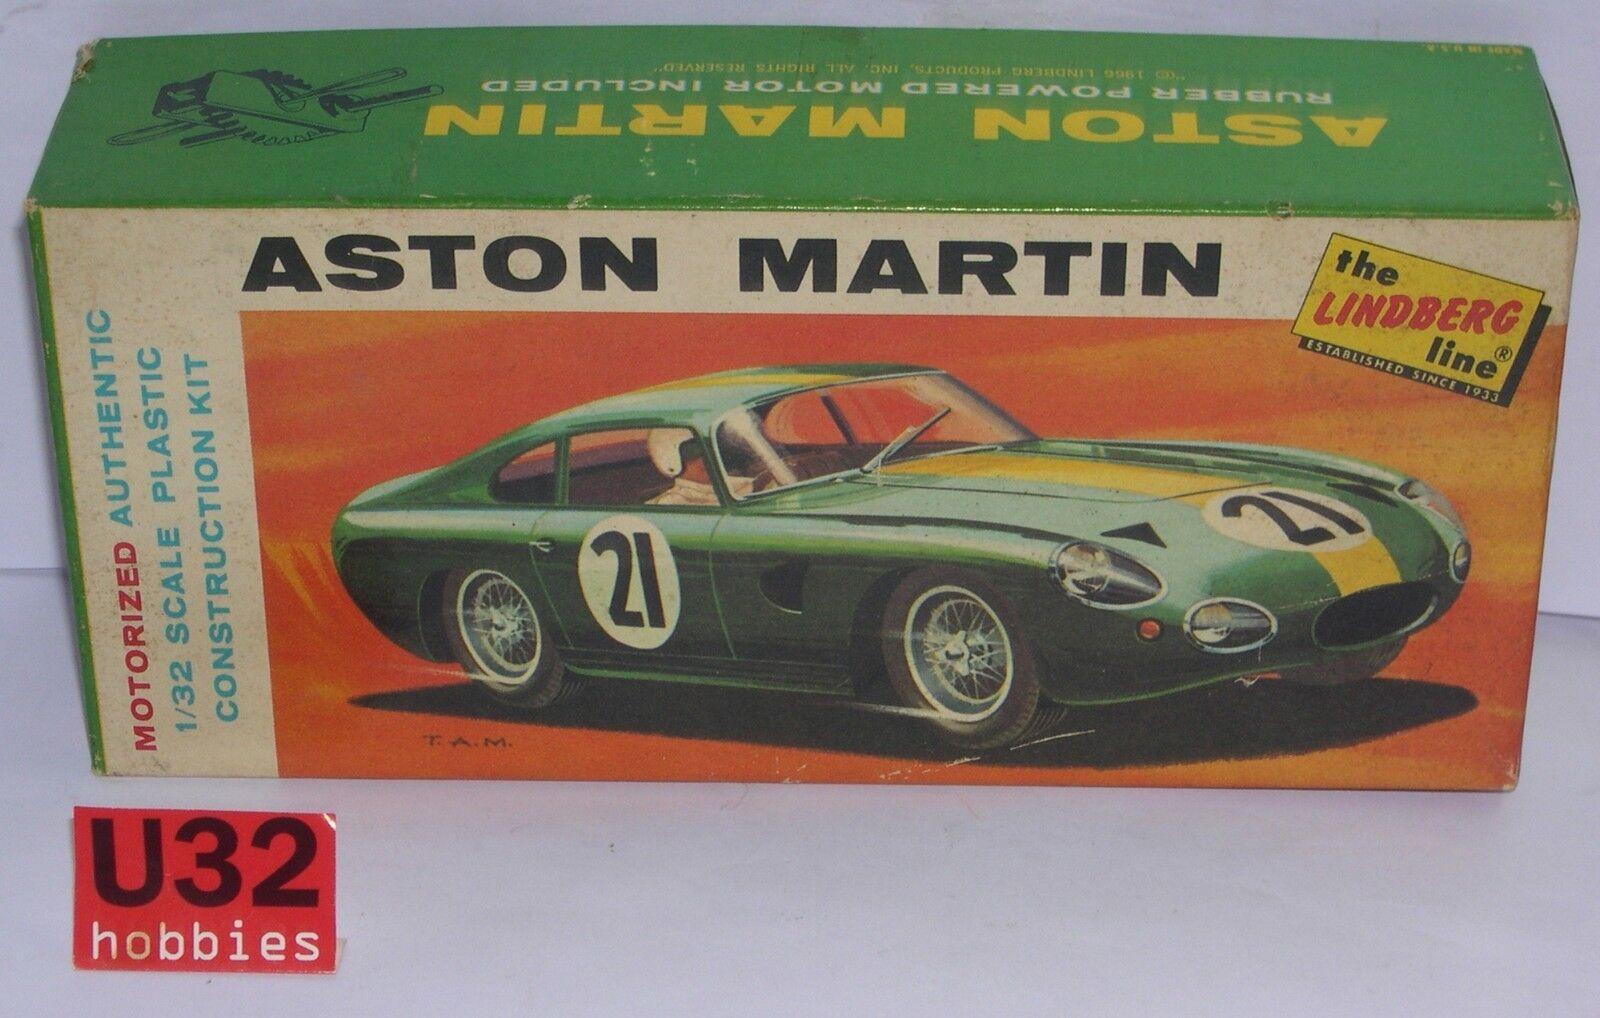 FN LINDBERG 6024 KIT 1 32 ASTON MARTIN MARTIN MARTIN 0d4ba6